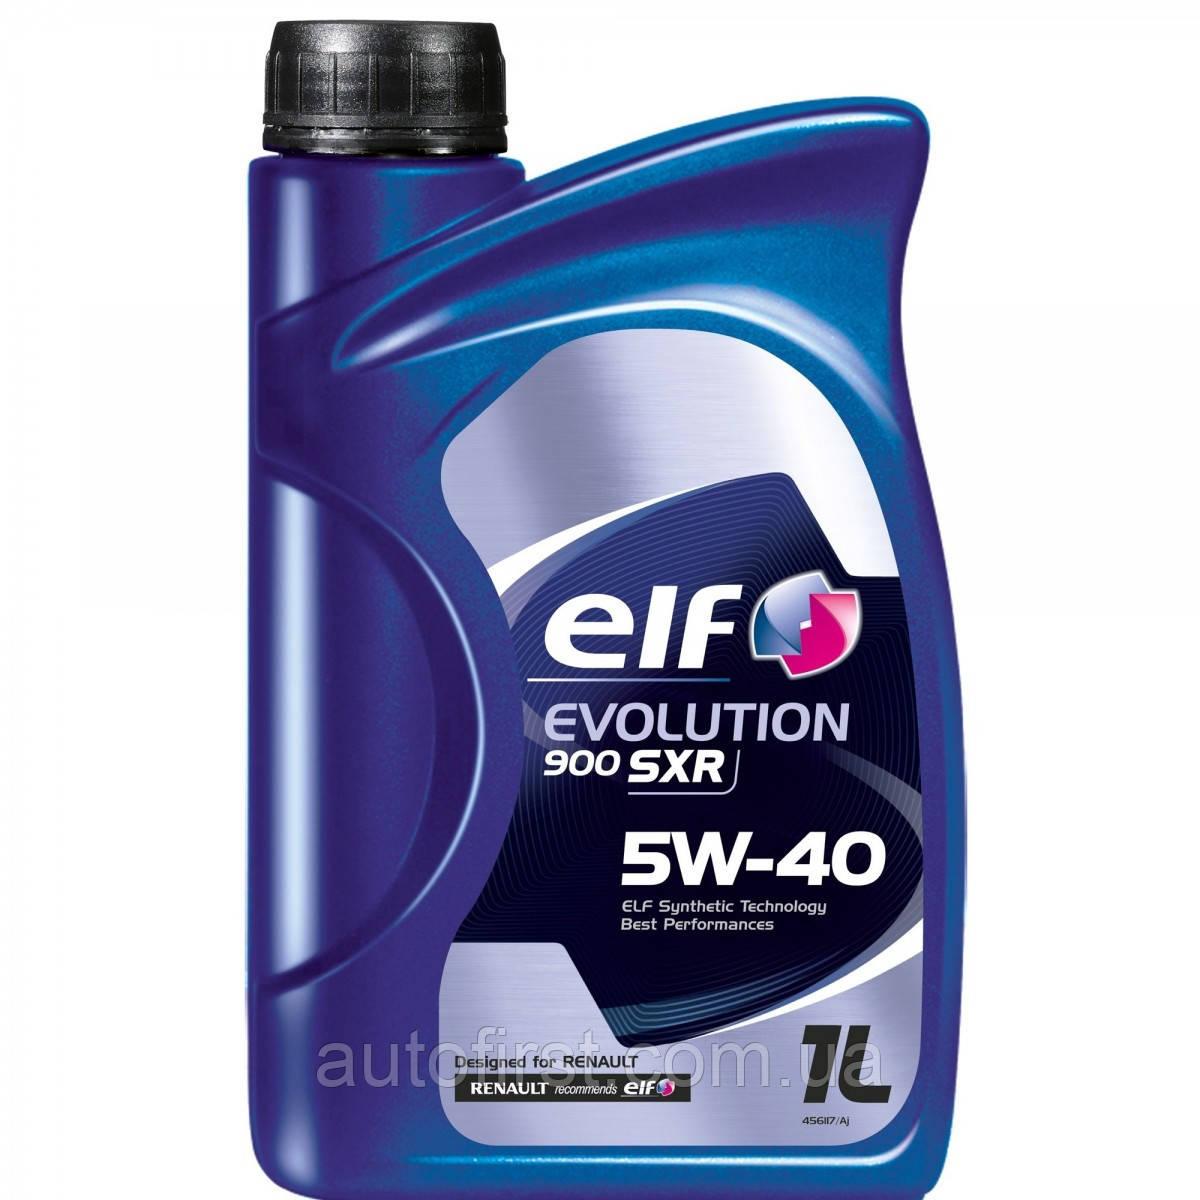 ELF Масло двигателя, Evolution 900 SXR 5W-40 1L